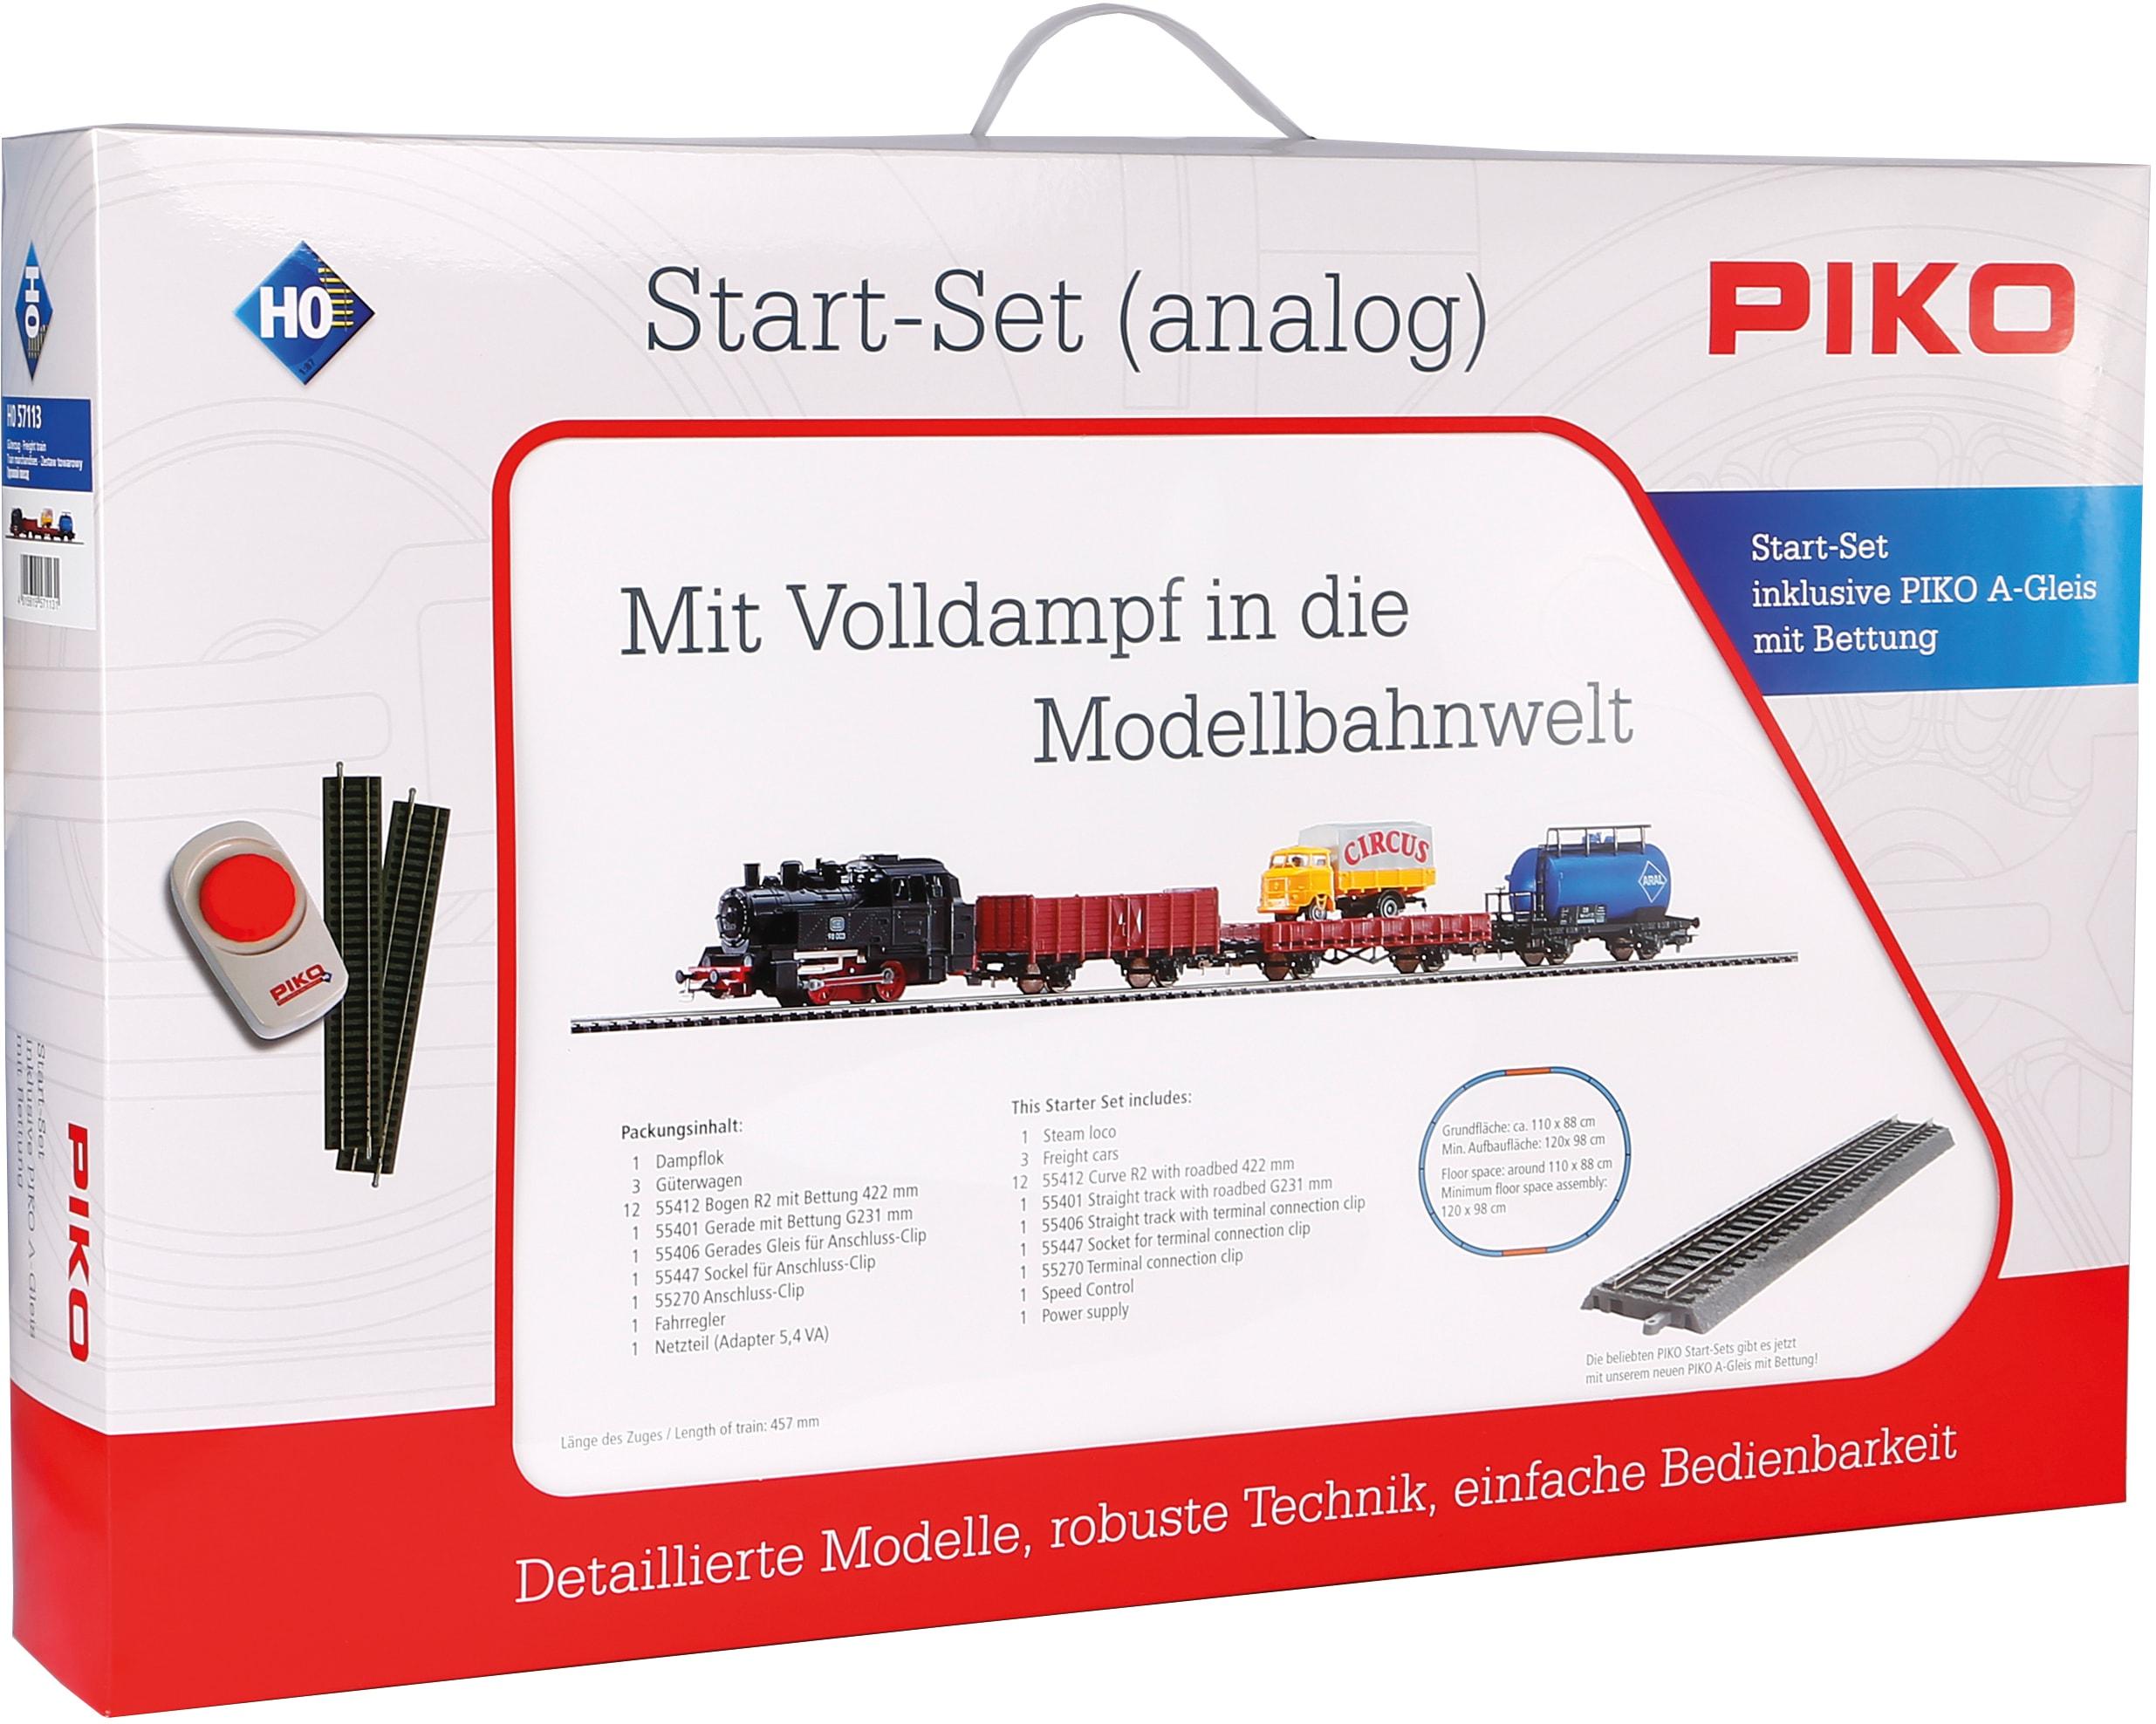 PIKO Modelleisenbahn Startpaket Güterzug mit Bettung, (57113) bunt Kinder Loks Wägen Modelleisenbahnen Autos, Eisenbahn Modellbau